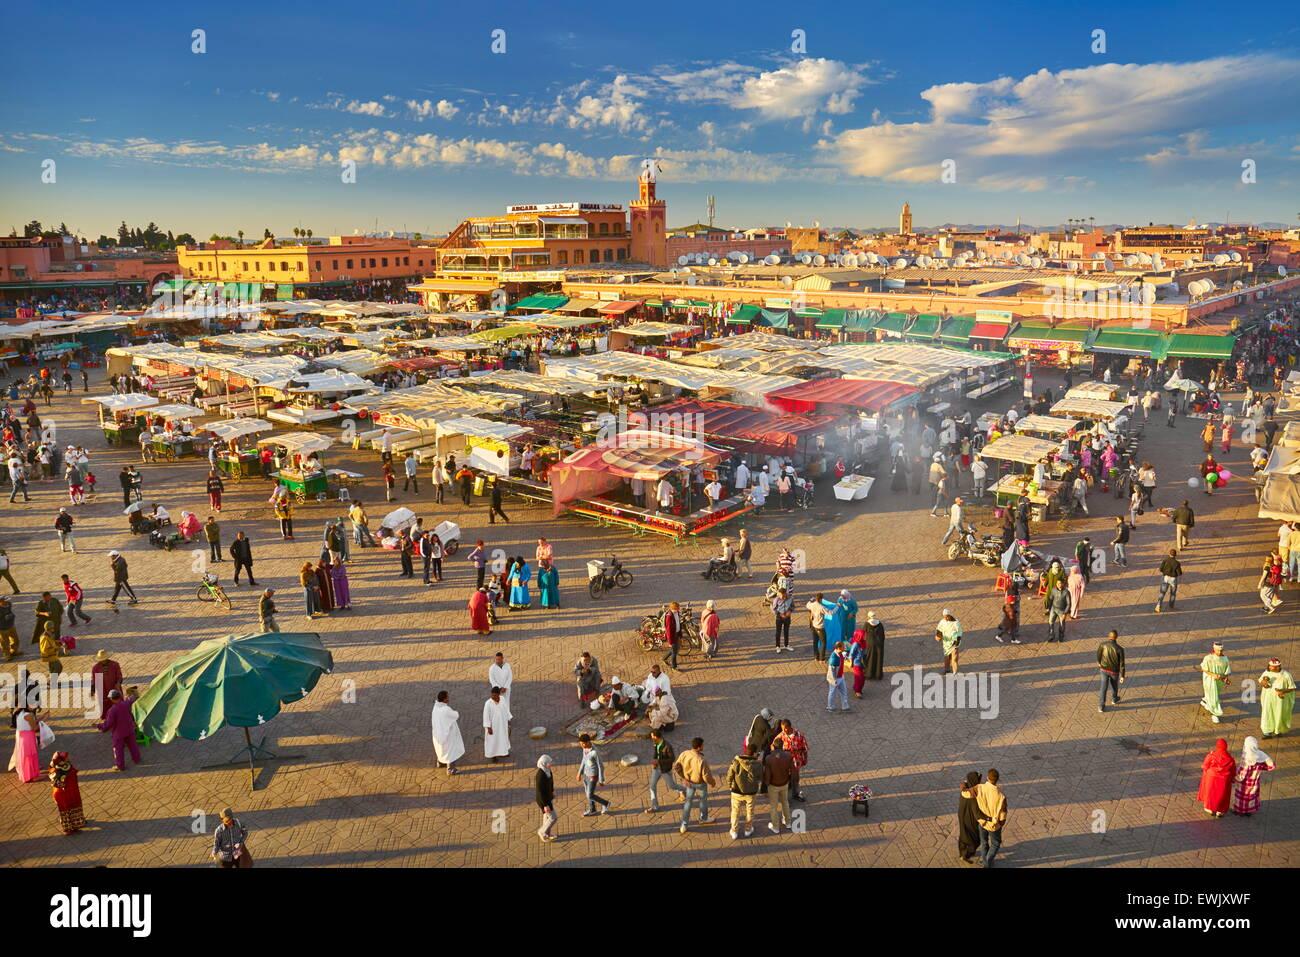 Djemaa el Fna, Medina di Marrakech, Marocco, Africa Immagini Stock